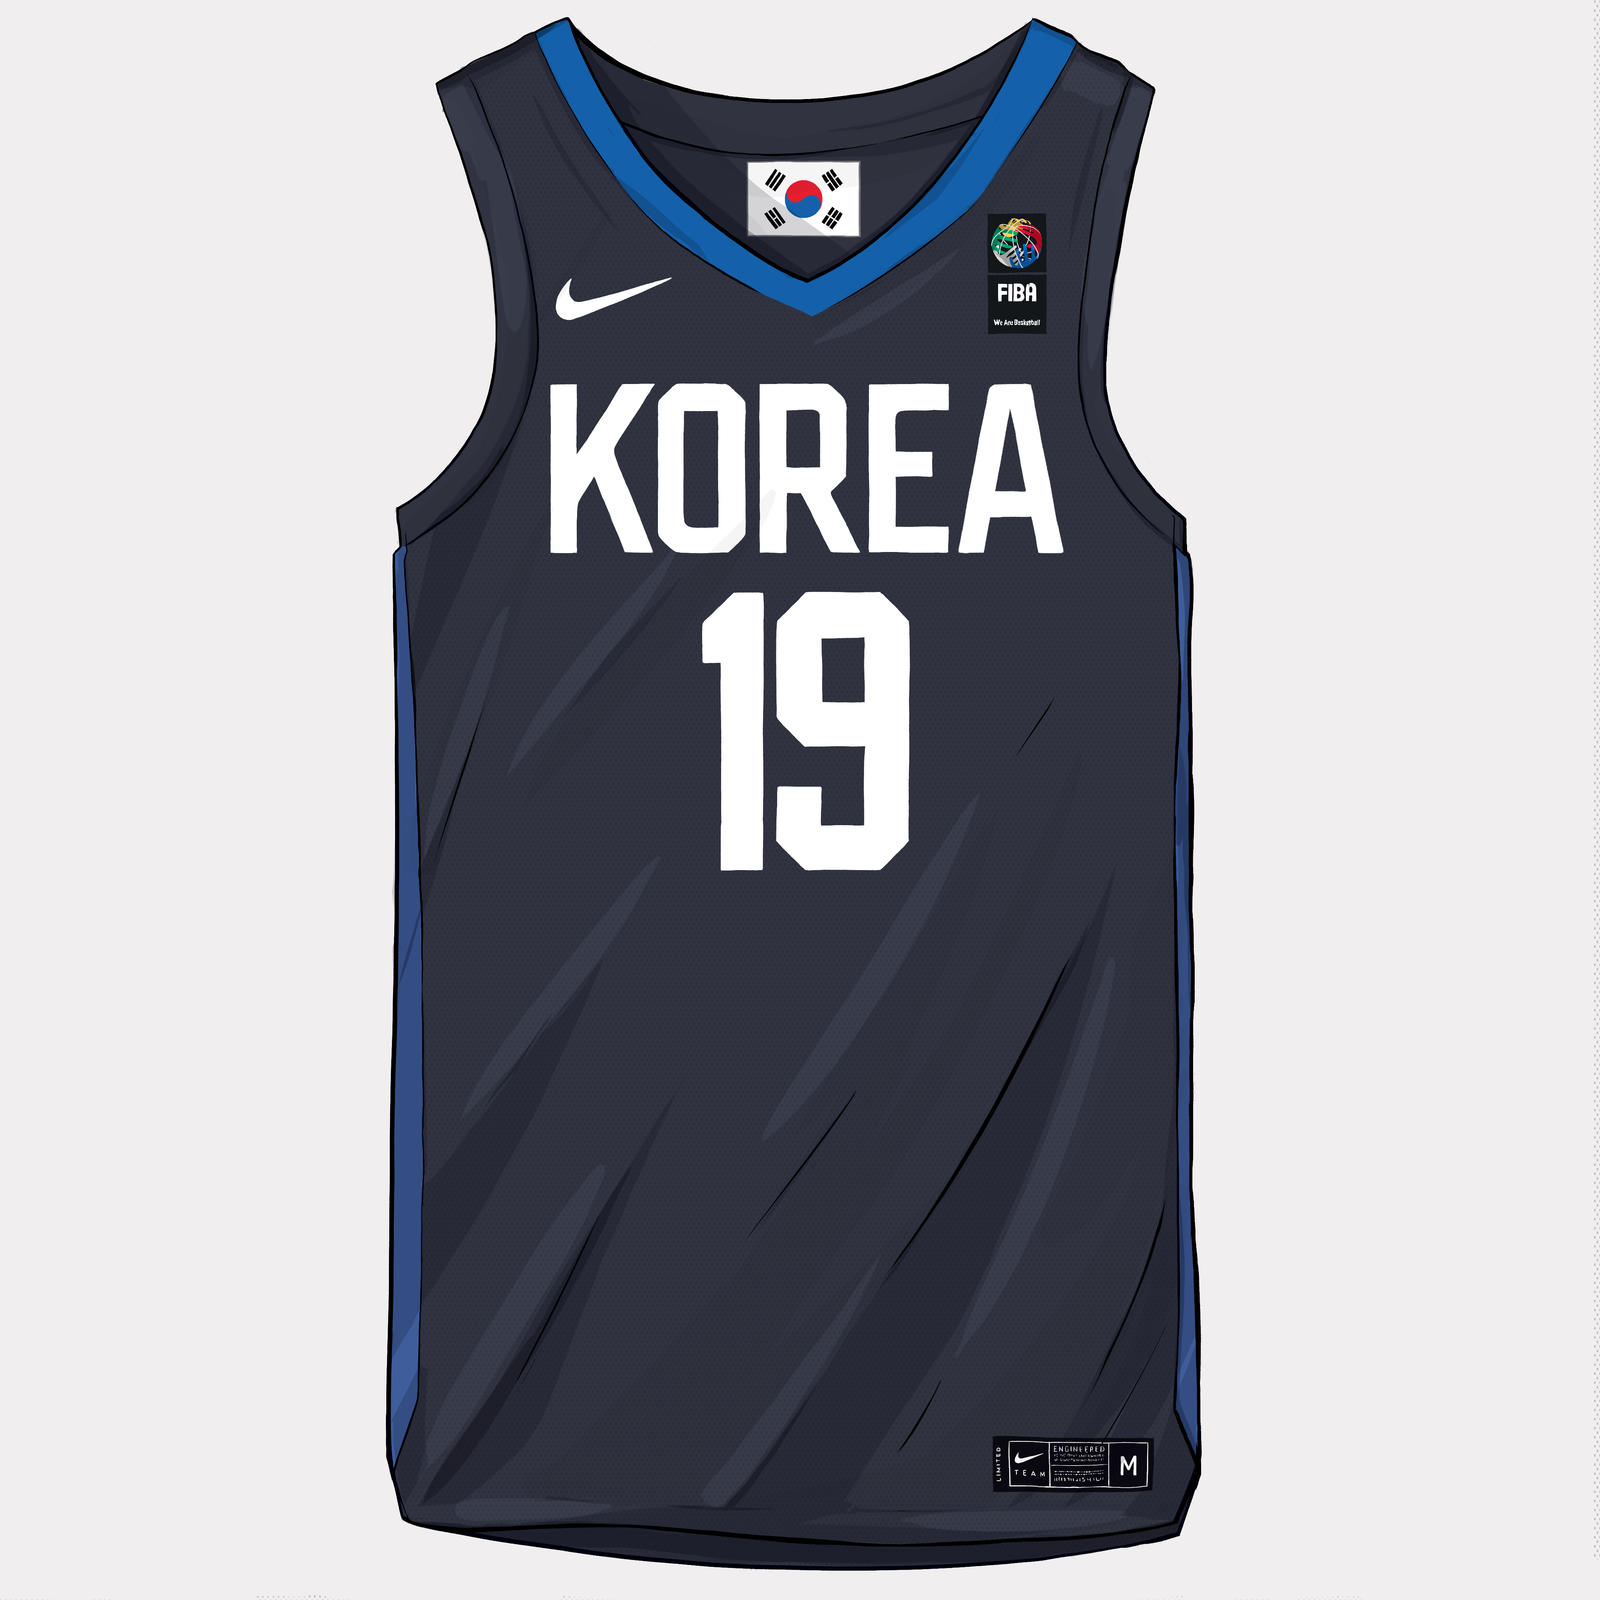 nike-news-korea-national-team-kit-2019-illustration-1x1_1_89542.jpg